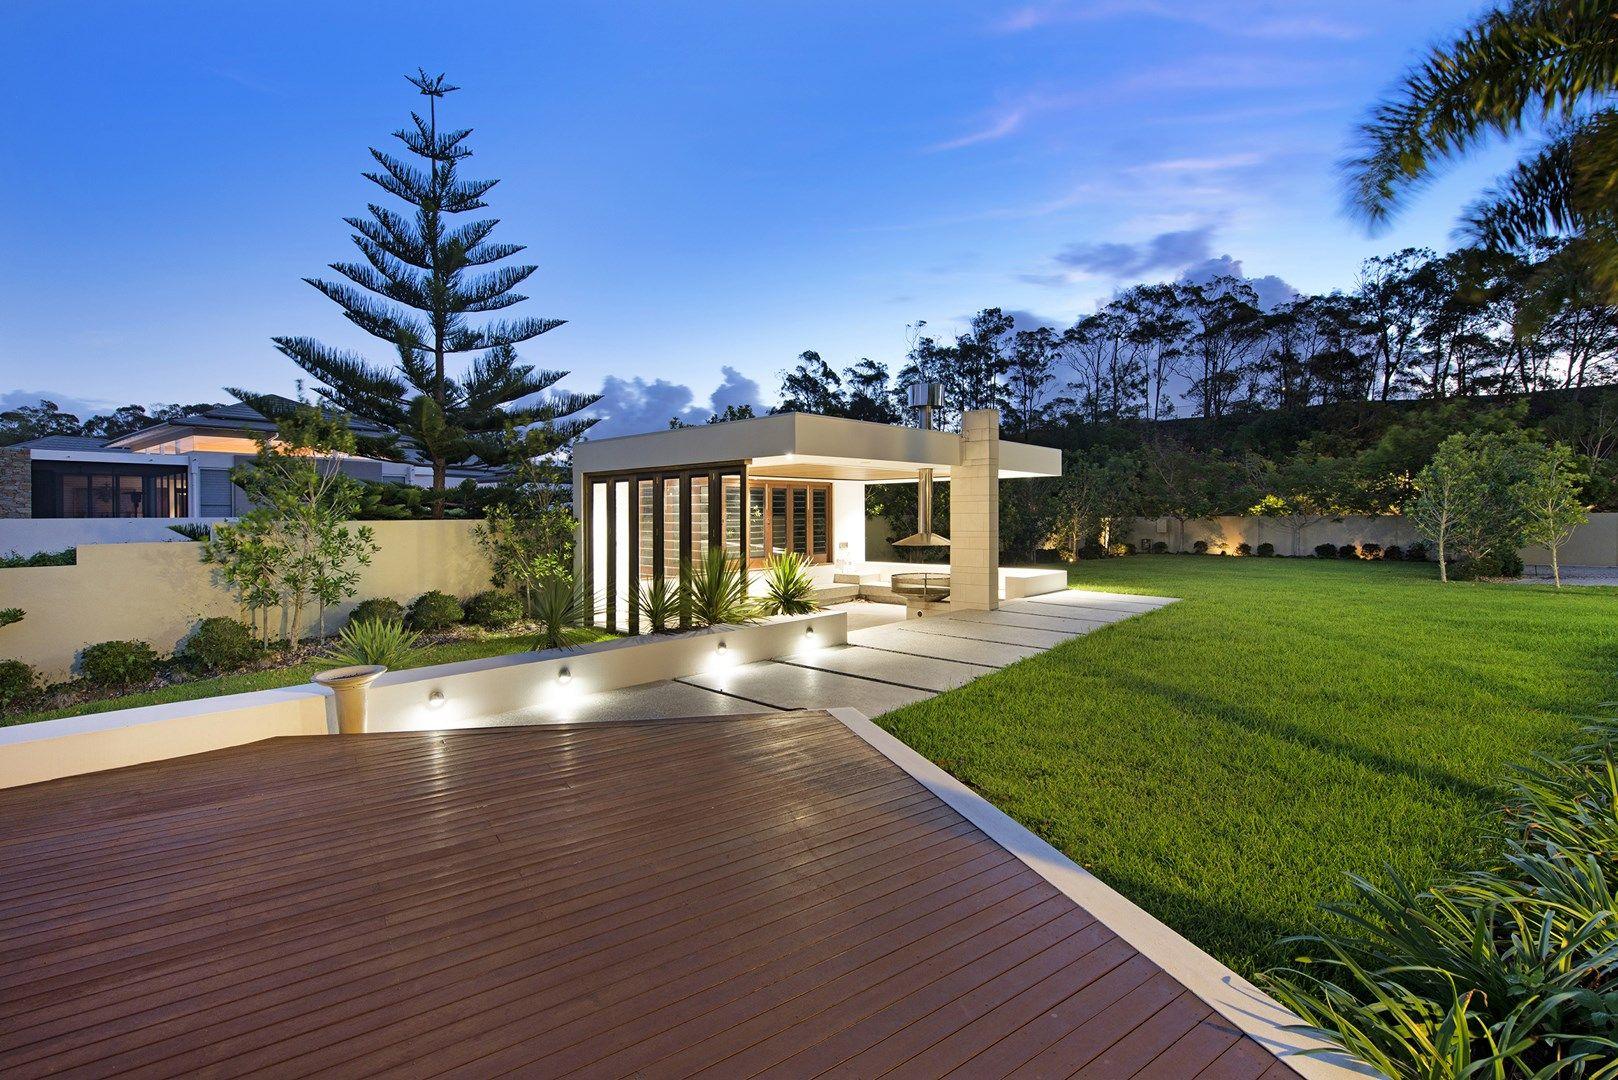 1019-1020 Edgecliffe Drive, Sanctuary Cove QLD 4212, Image 1